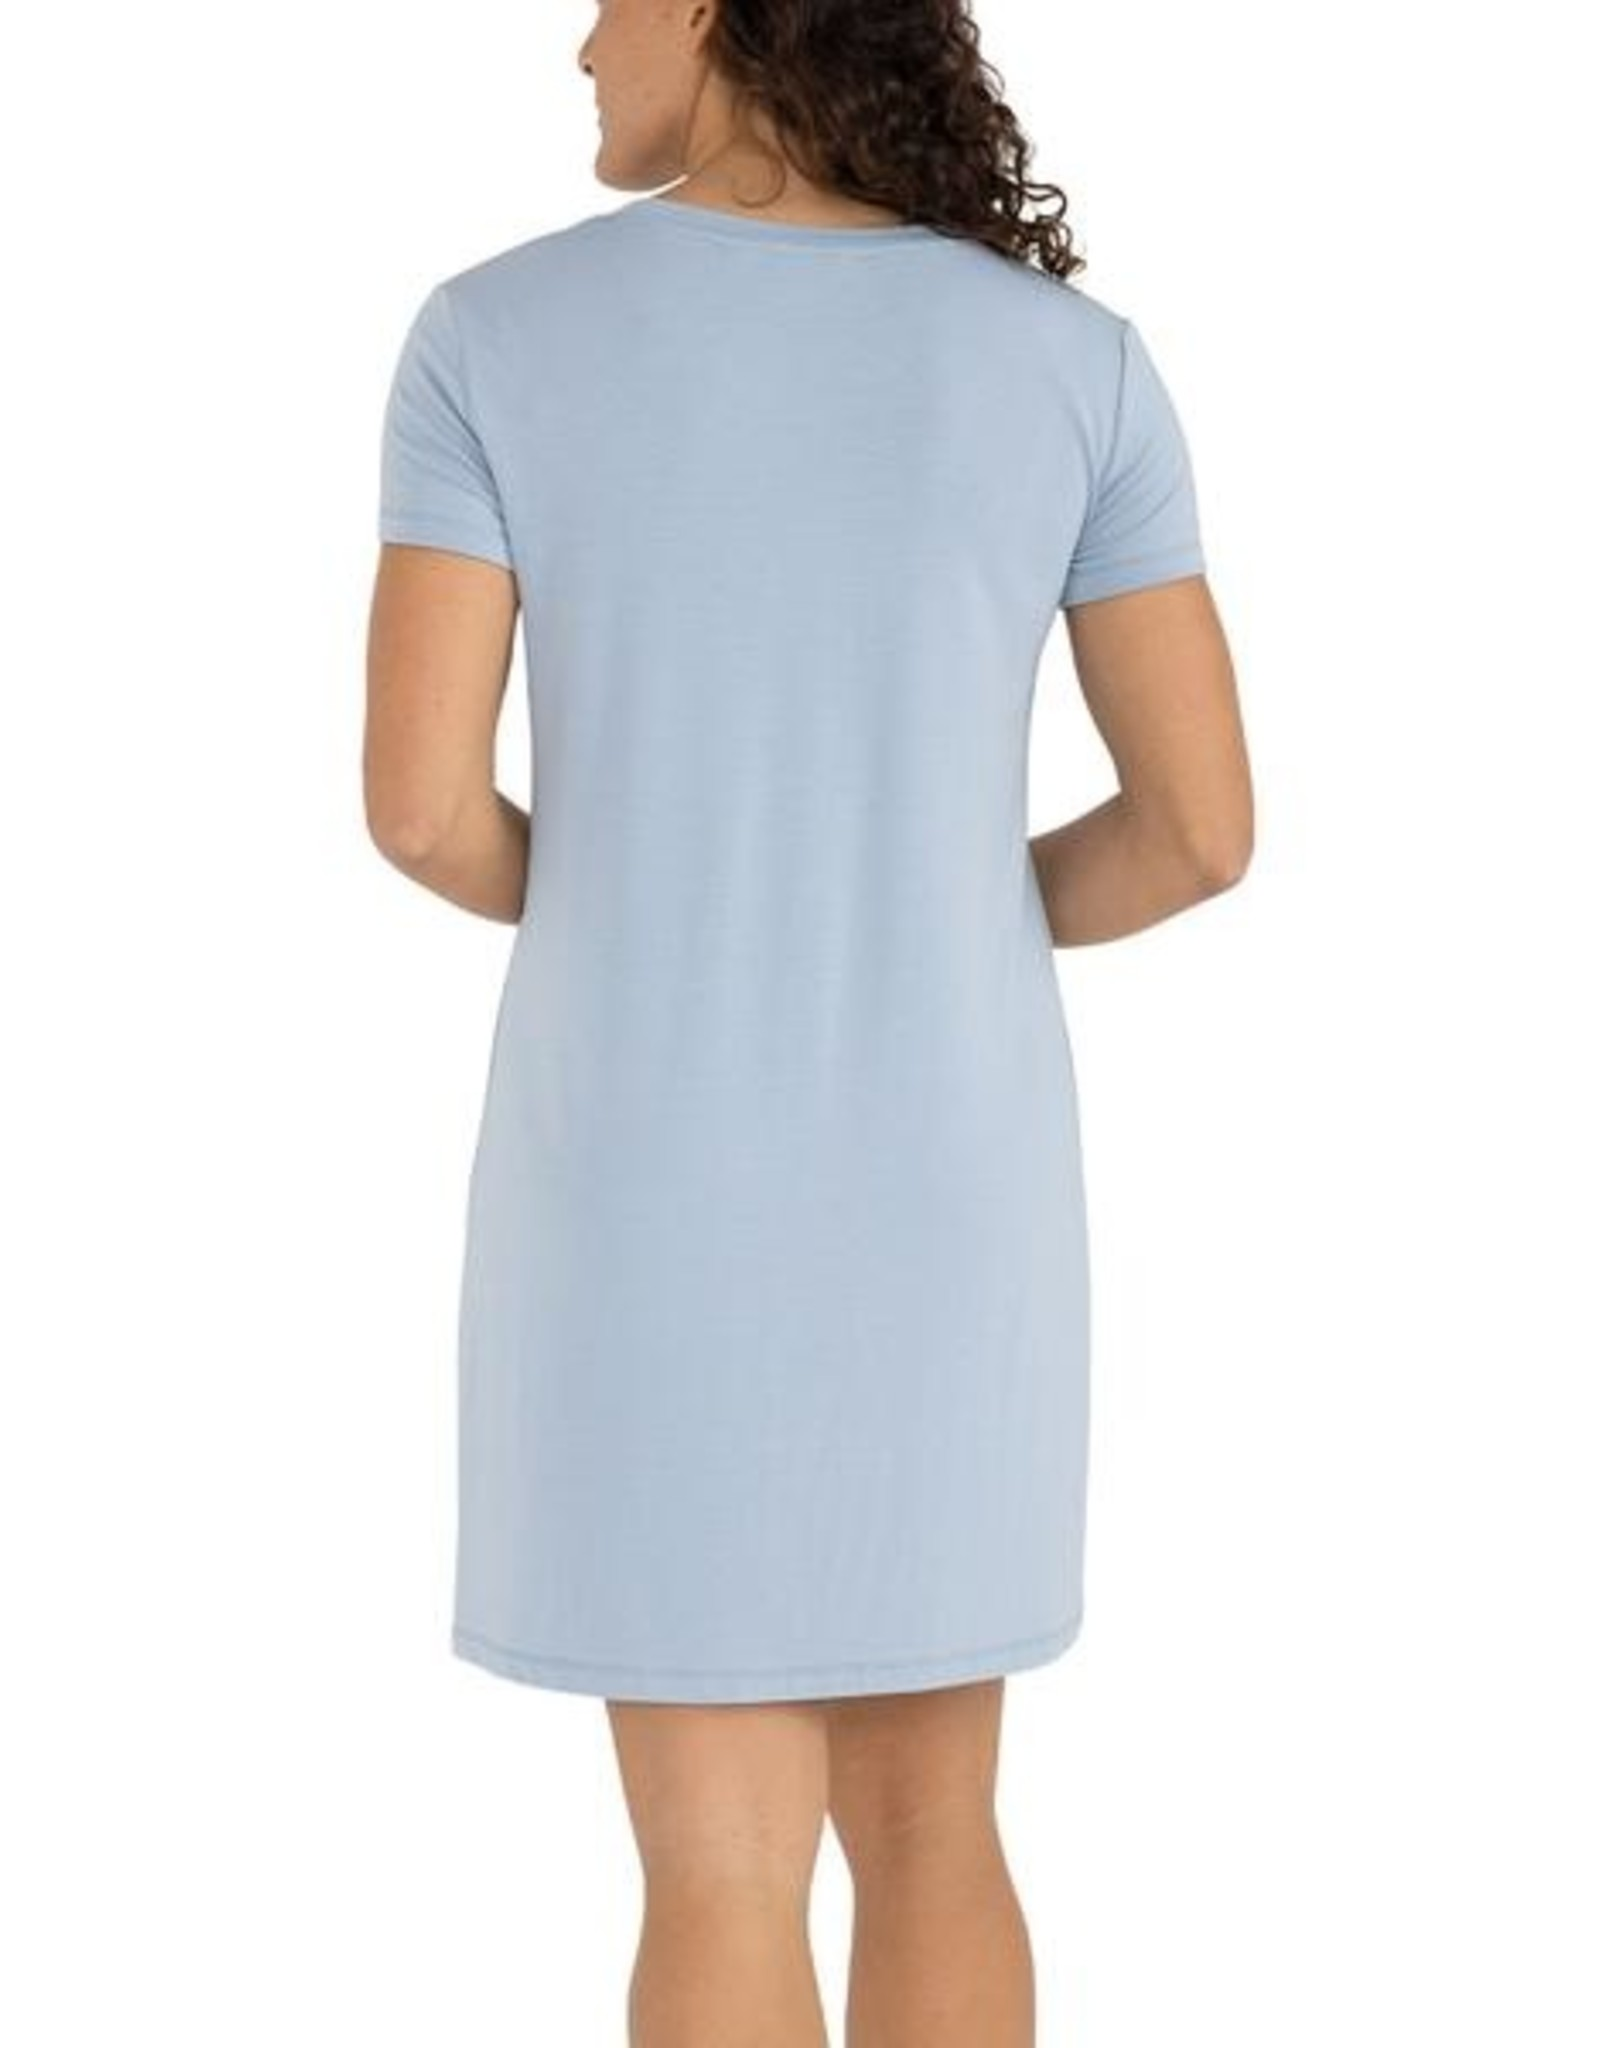 Free Fly Bamboo Flex Pocket Dress